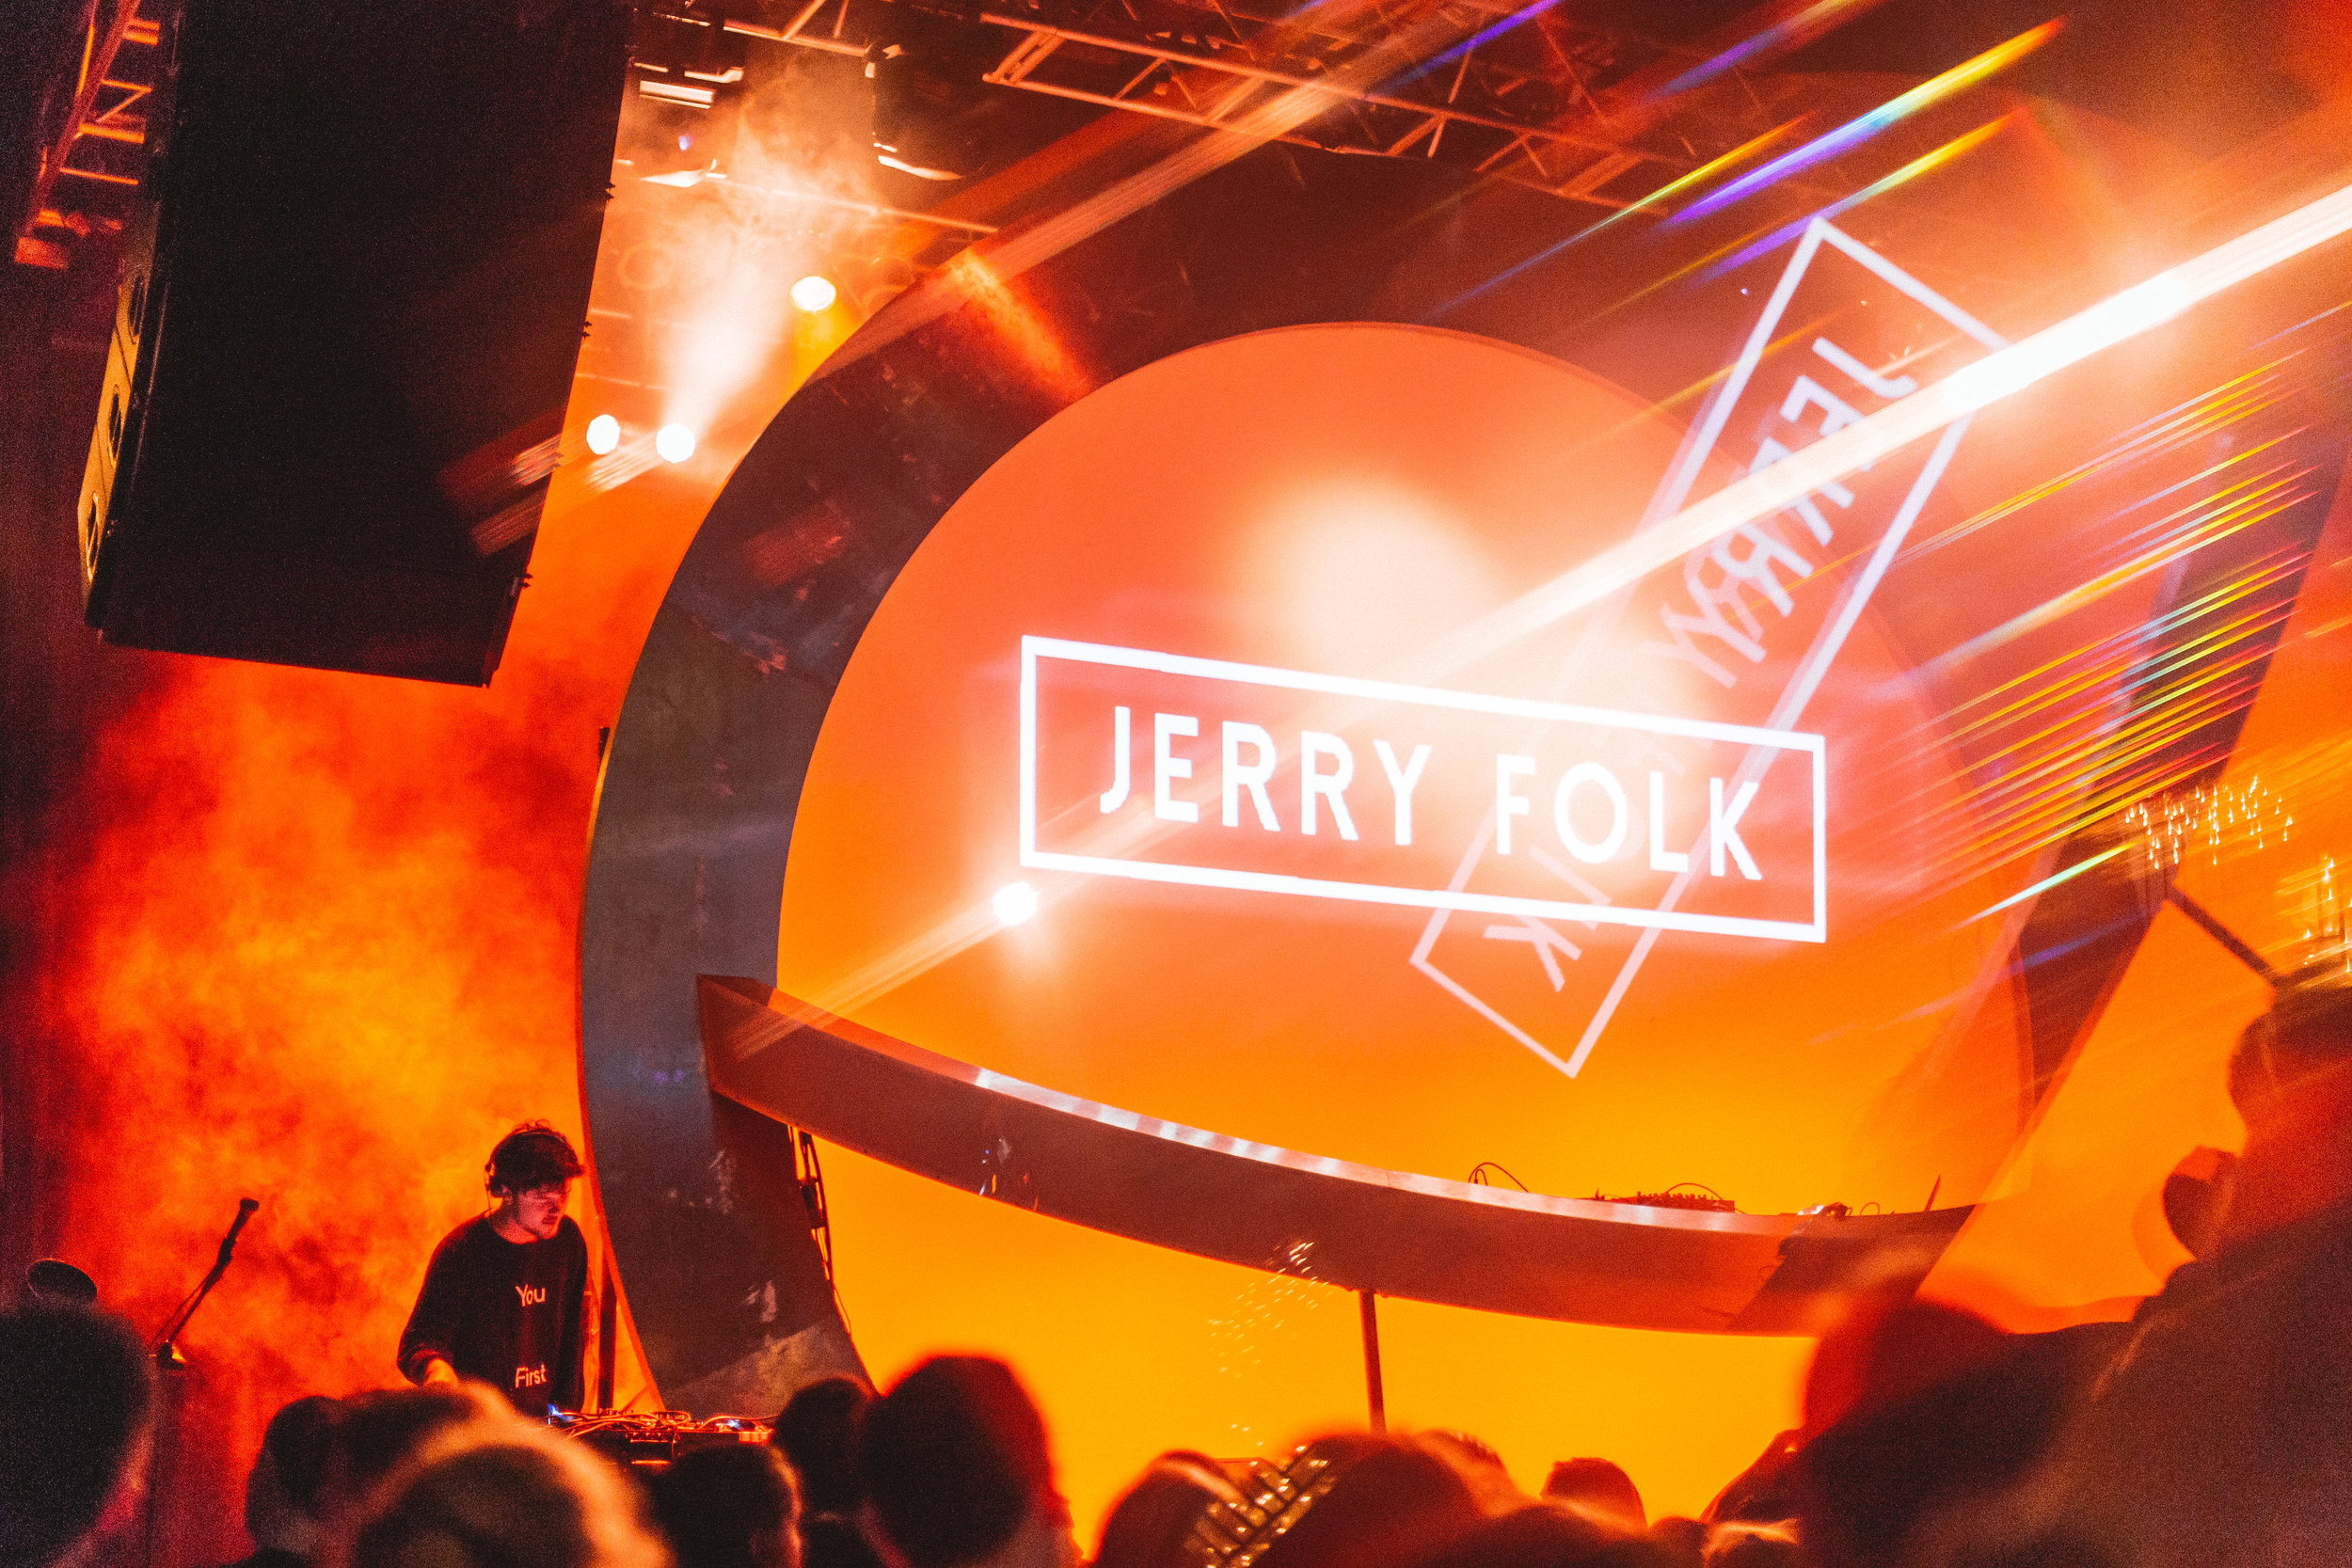 Jerry Folk @ 9-30 Club Preview-1.jpg